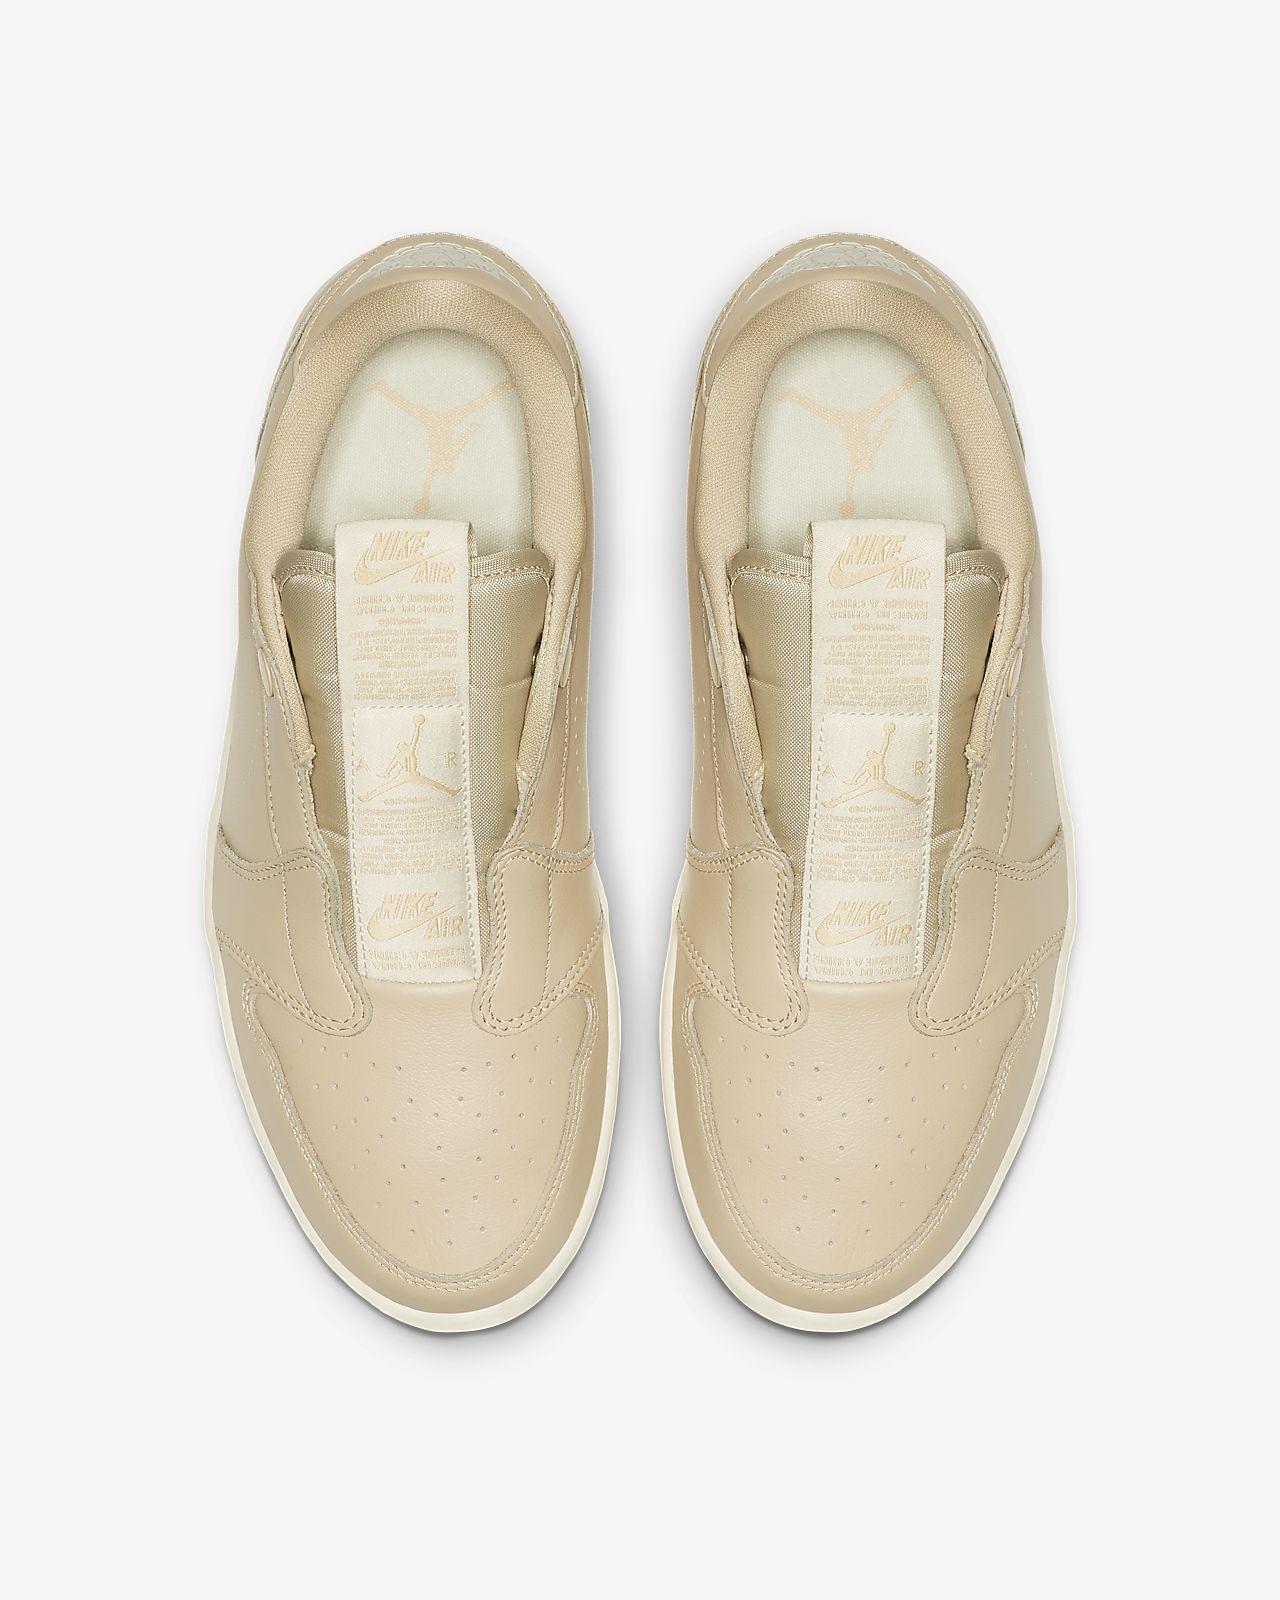 95f3b06982f Chaussure Air Jordan 1 Retro Low Slip pour Femme. Nike.com BE